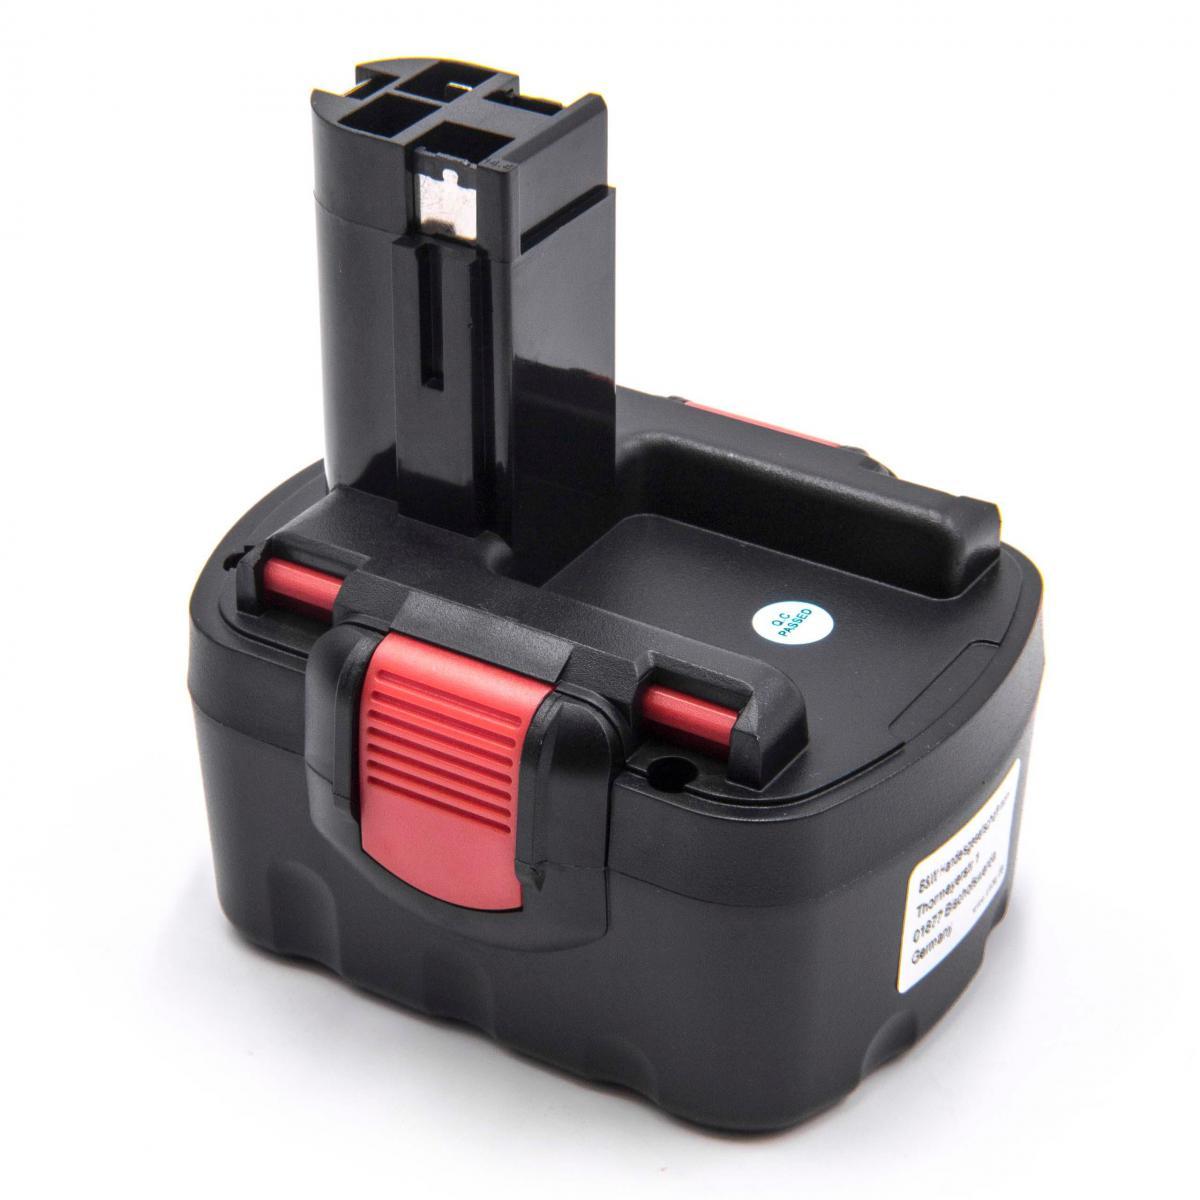 Vhbw vhbw Batterie compatible avec Bosch PKS 14.4V, PSB 14, PSB 14.4V, PSR 14.4, PSR 14.4-2, PSR 14.4/N outil électrique (150